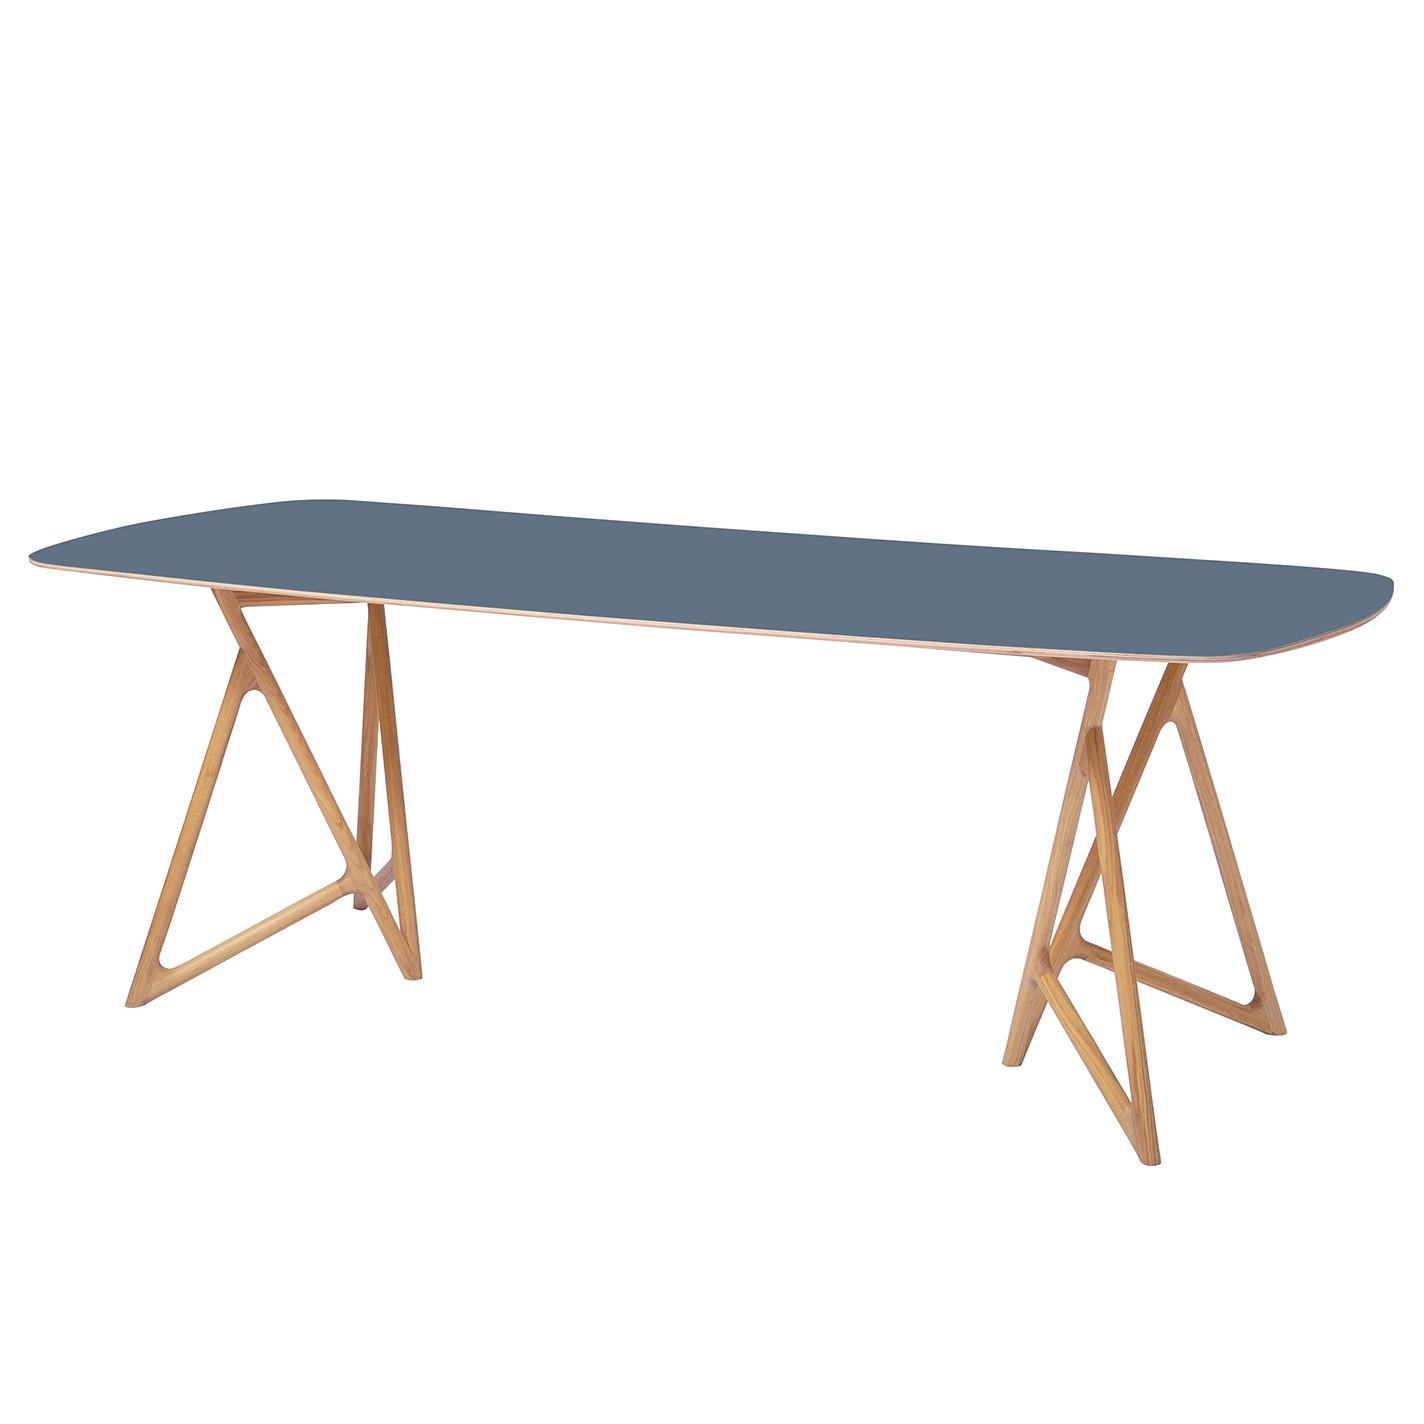 Home 24 - Table à manger koza - chêne massif / linoléum - pétrole / chêne - 180 x 90 cm, studio copenhagen